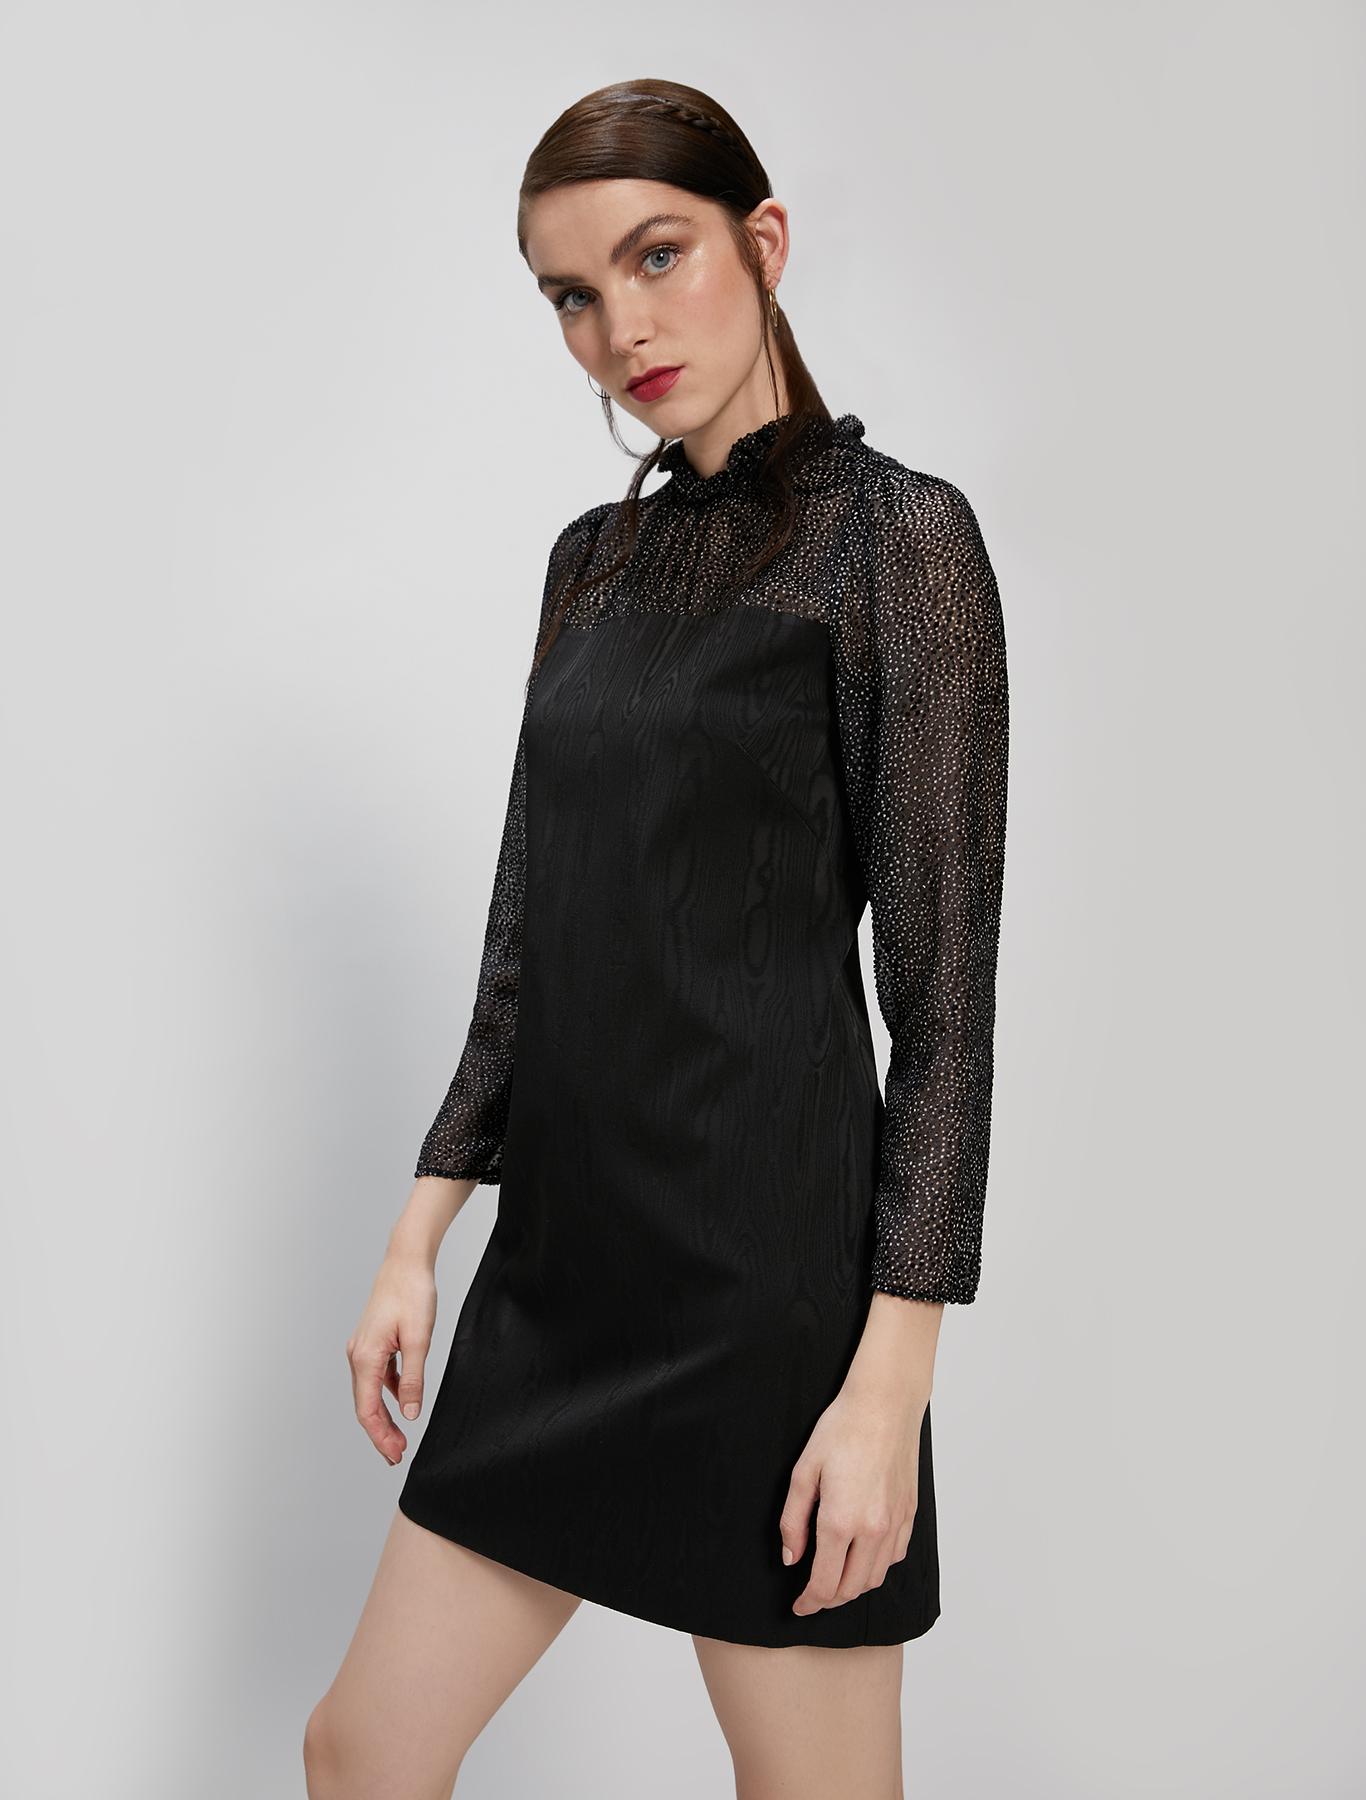 Moiré and georgette dress - black - pennyblack